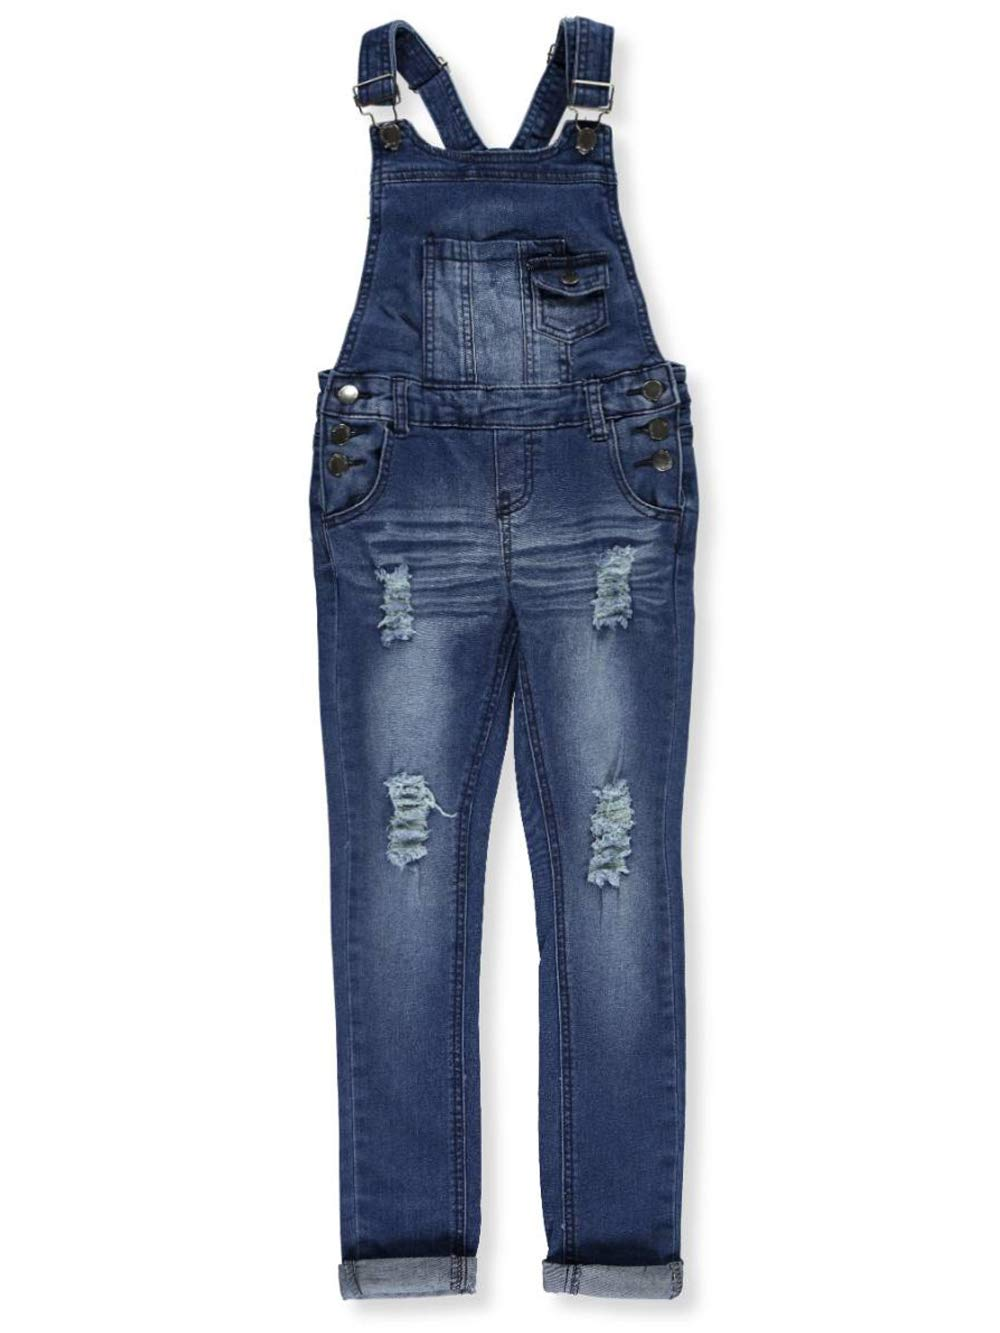 Teen G's Big Girls' Skinny Overalls - Medium Blue, 7